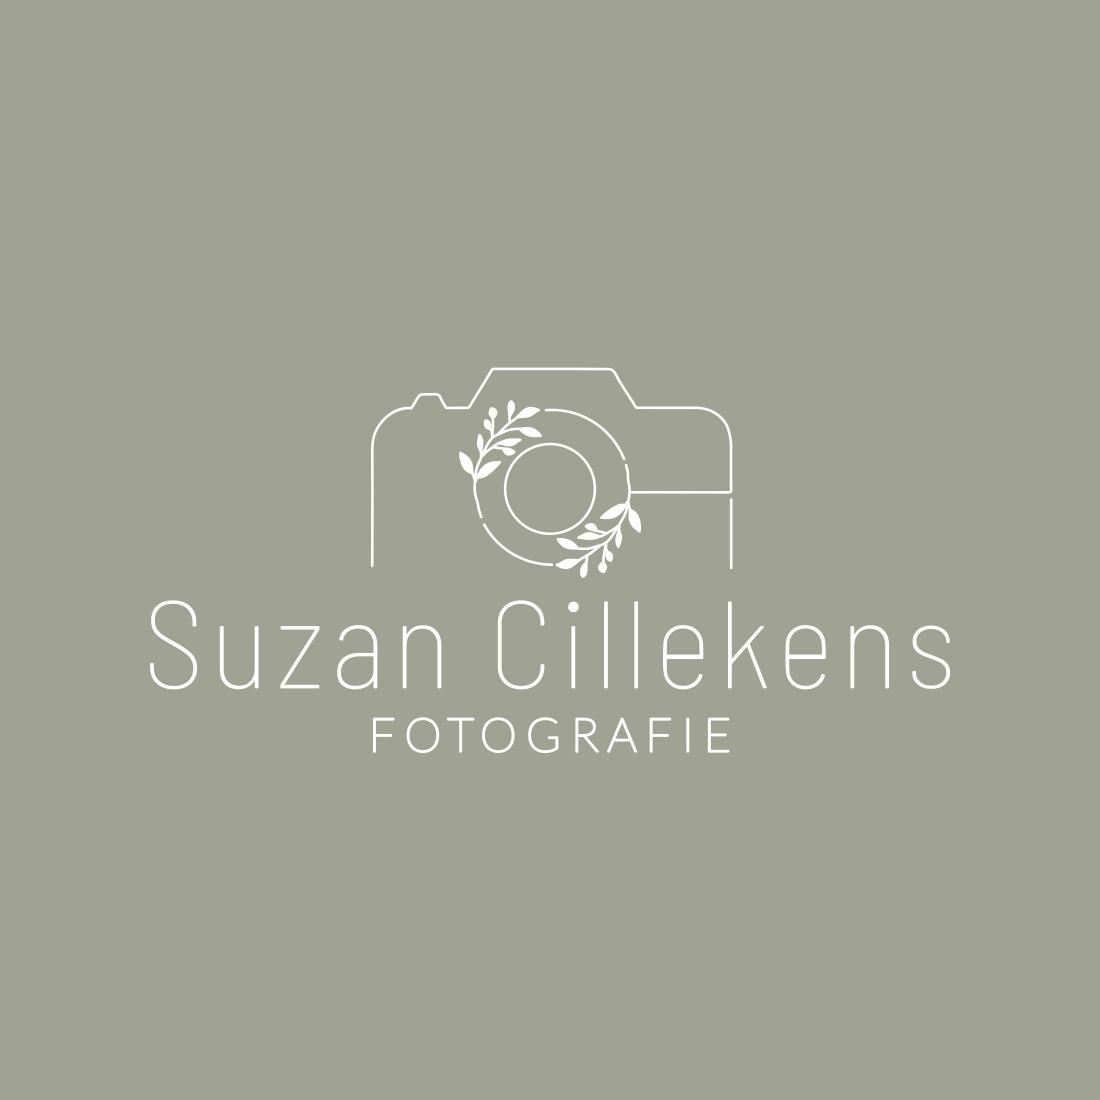 Suzan Cillekens Fotografie logo